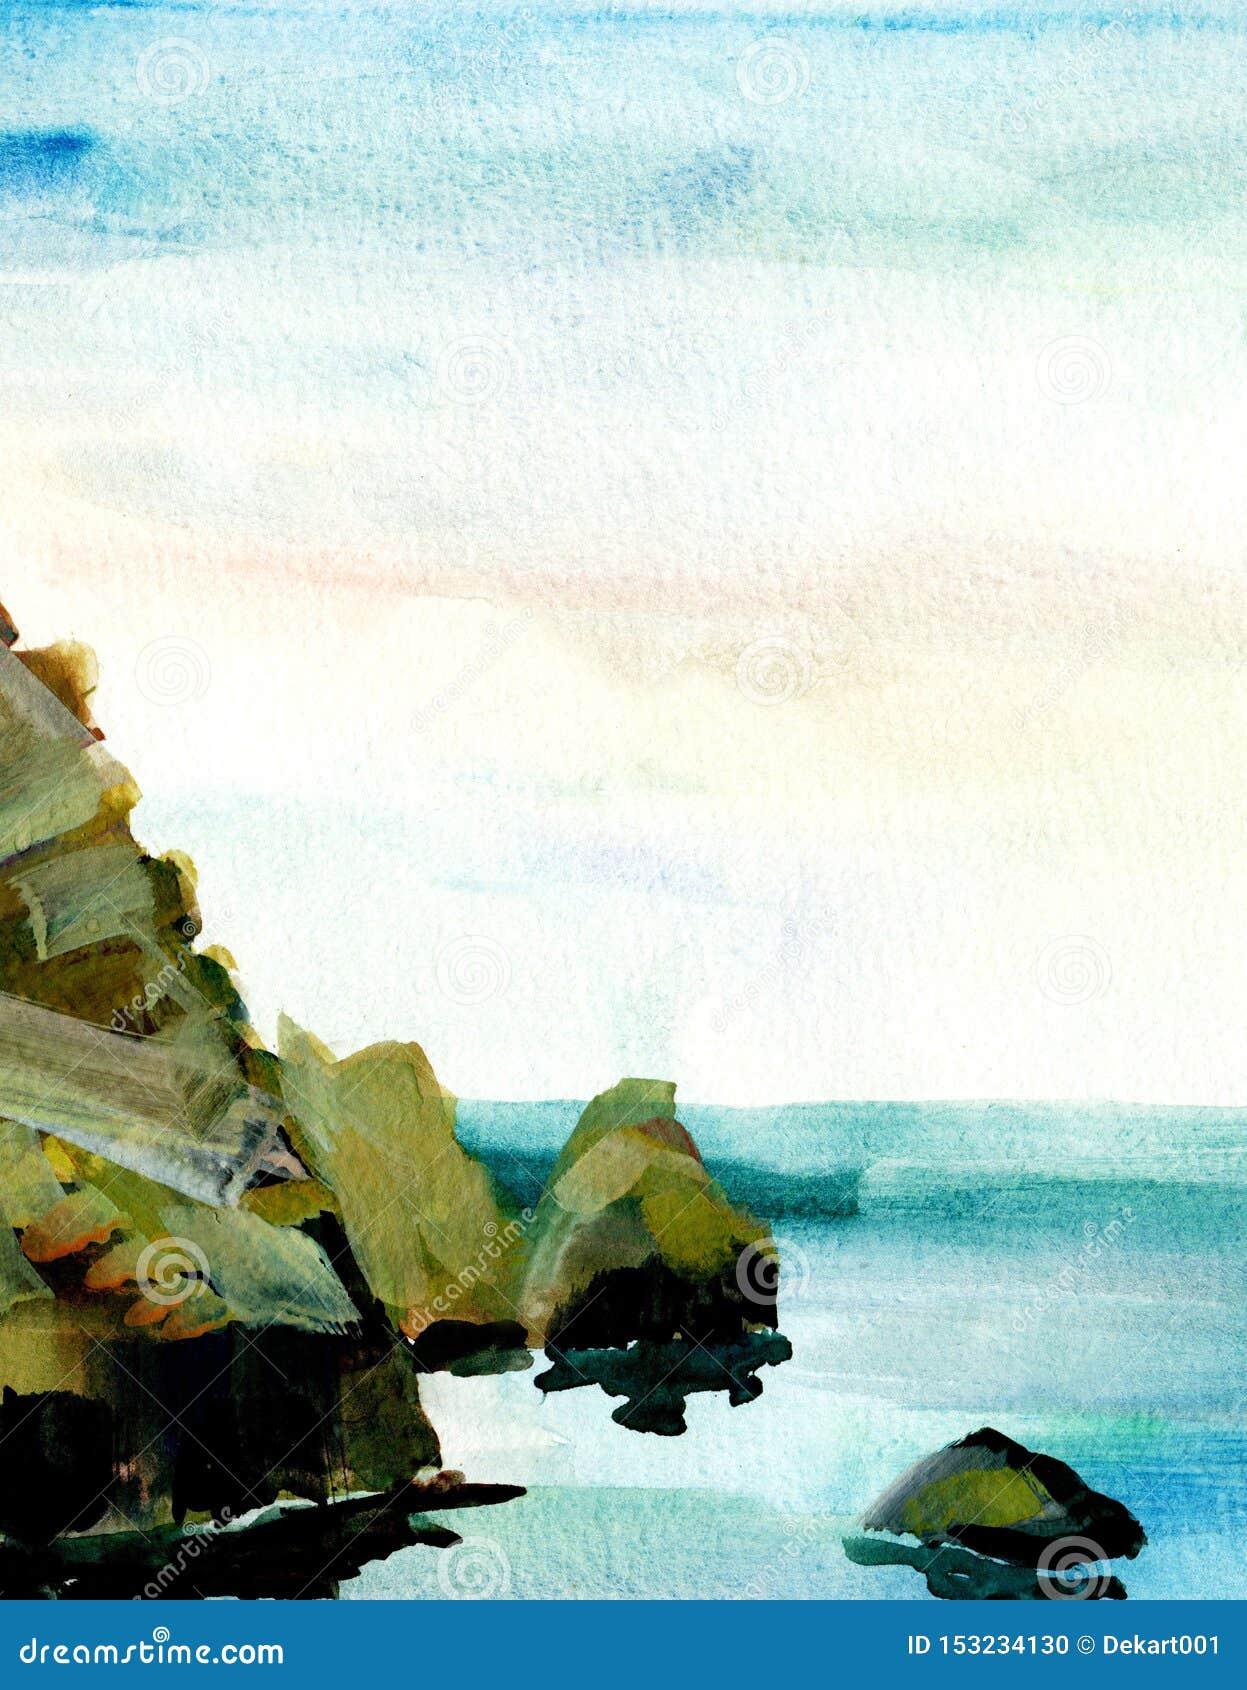 Seelandschaft, Seeseite, Strand, Felsen Sch?ne Aquarellhandmalereiillustration